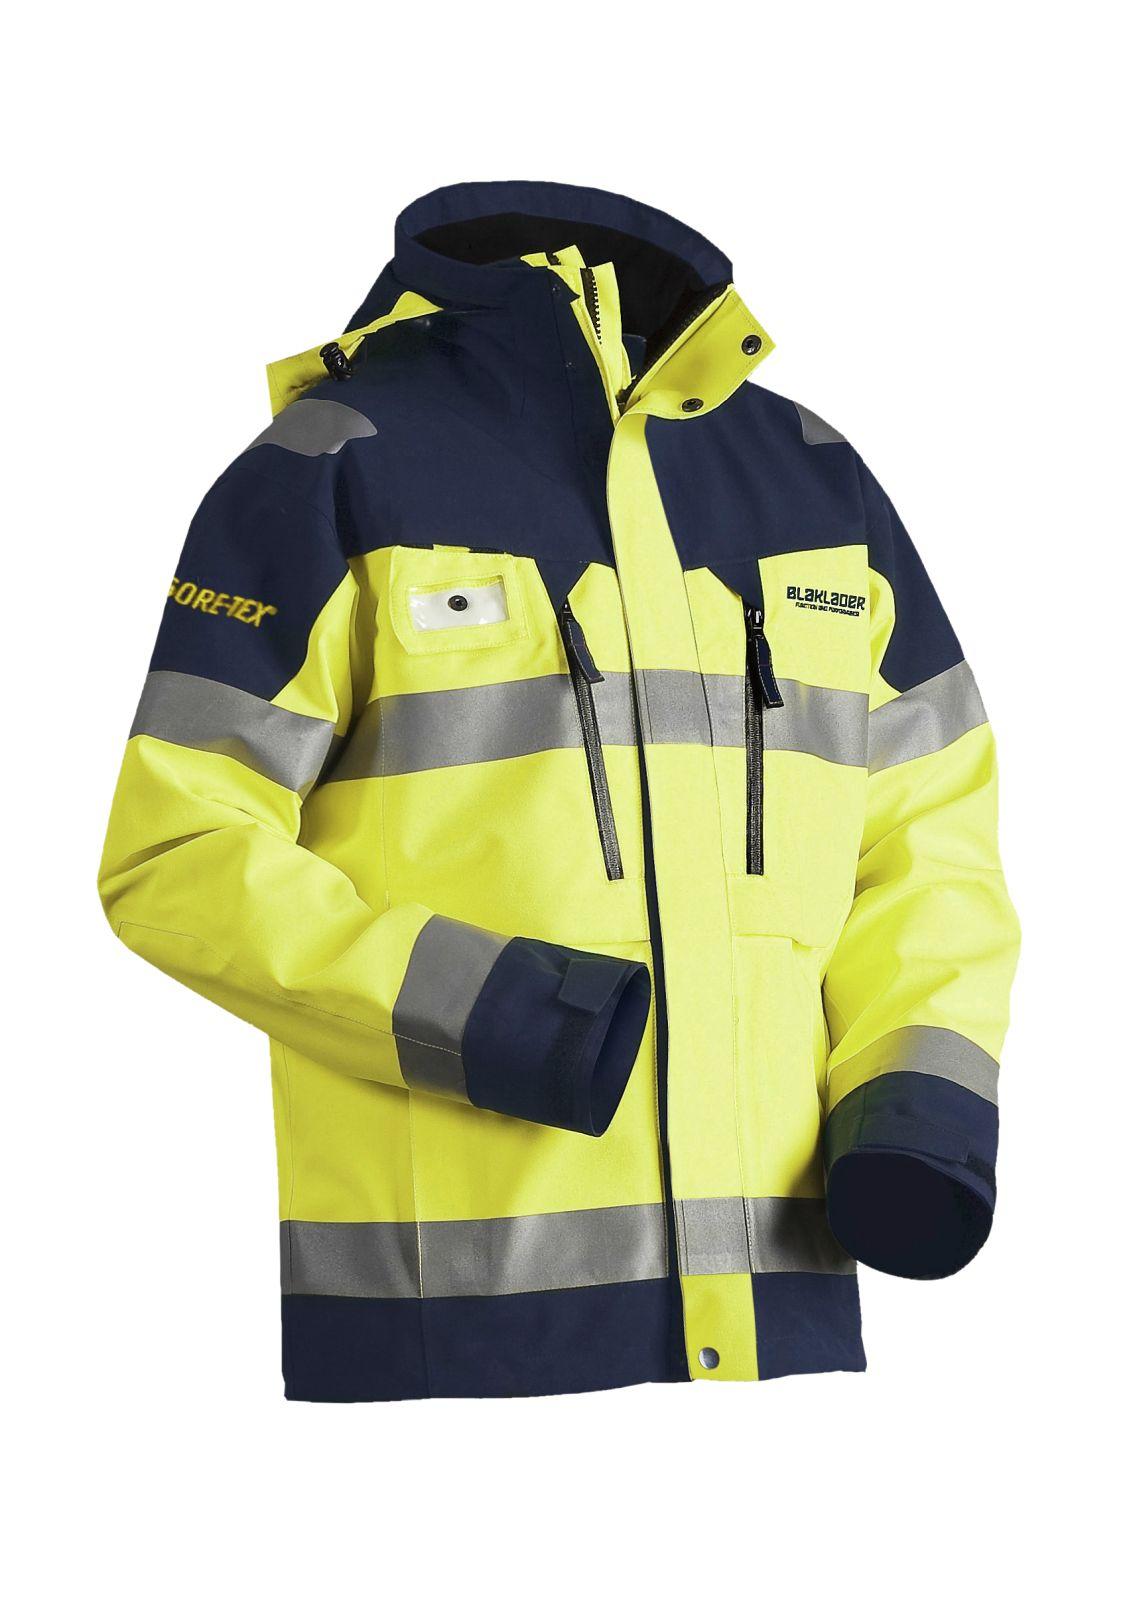 Blaklader Werkjacks 48081979 High Vis geel-marineblauw(3389)